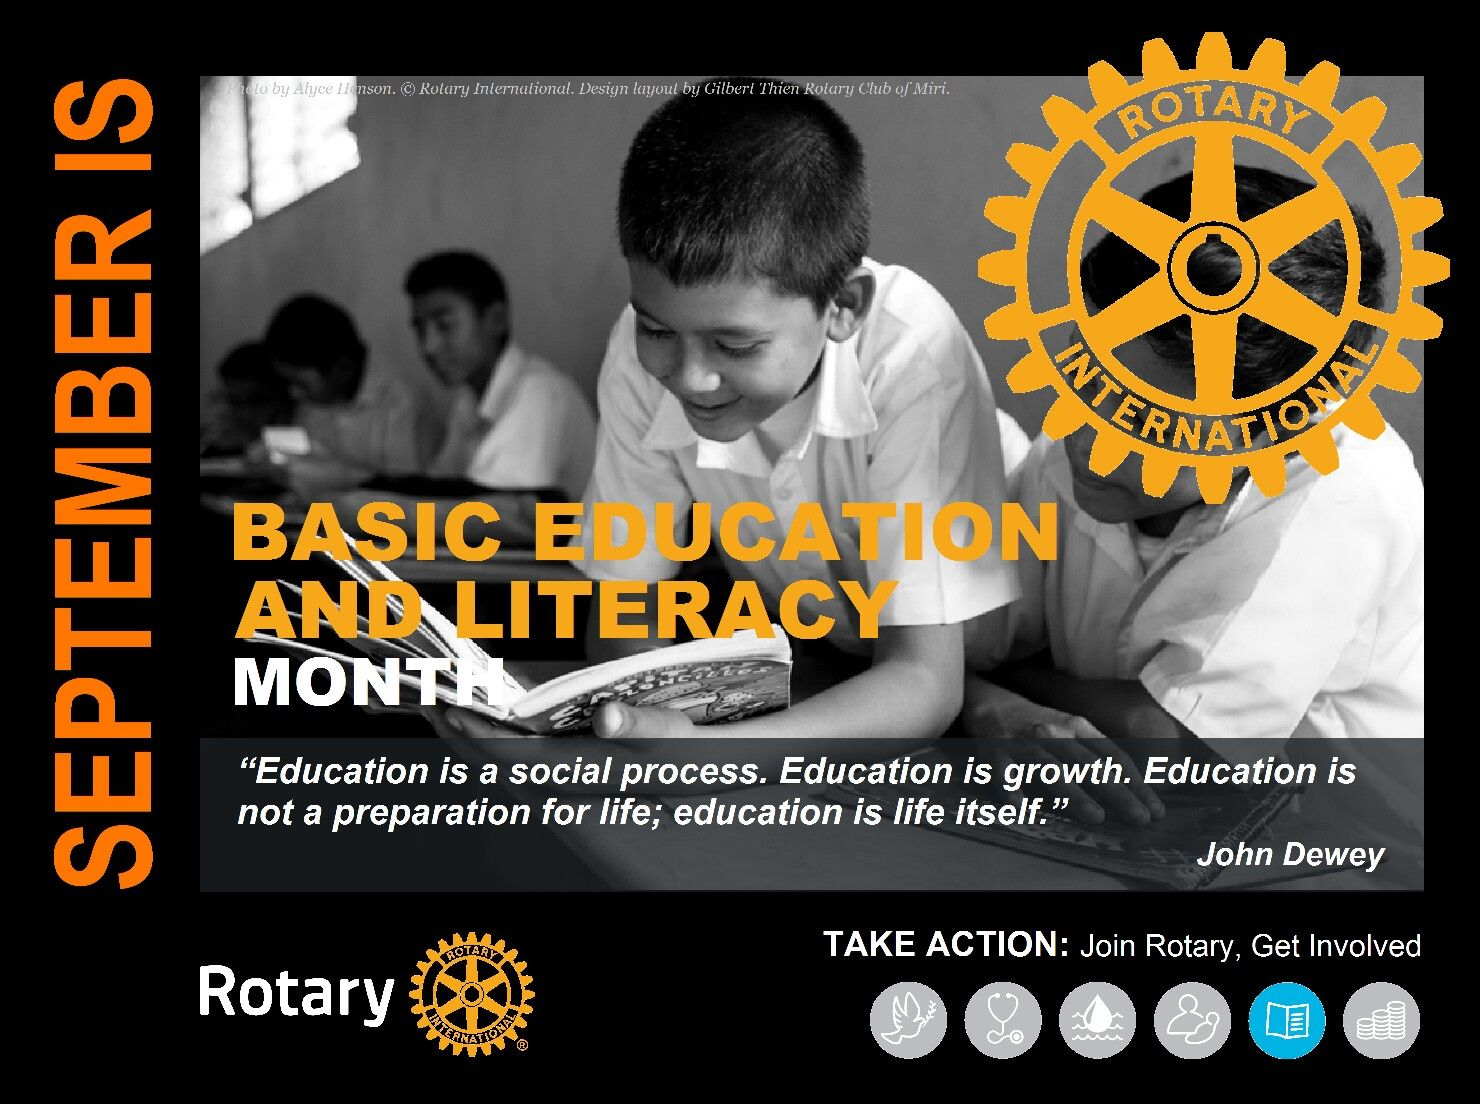 Rotary Mini Poster September Basic Education And Literacy Month By Gt Education And Literacy Education Rotary International